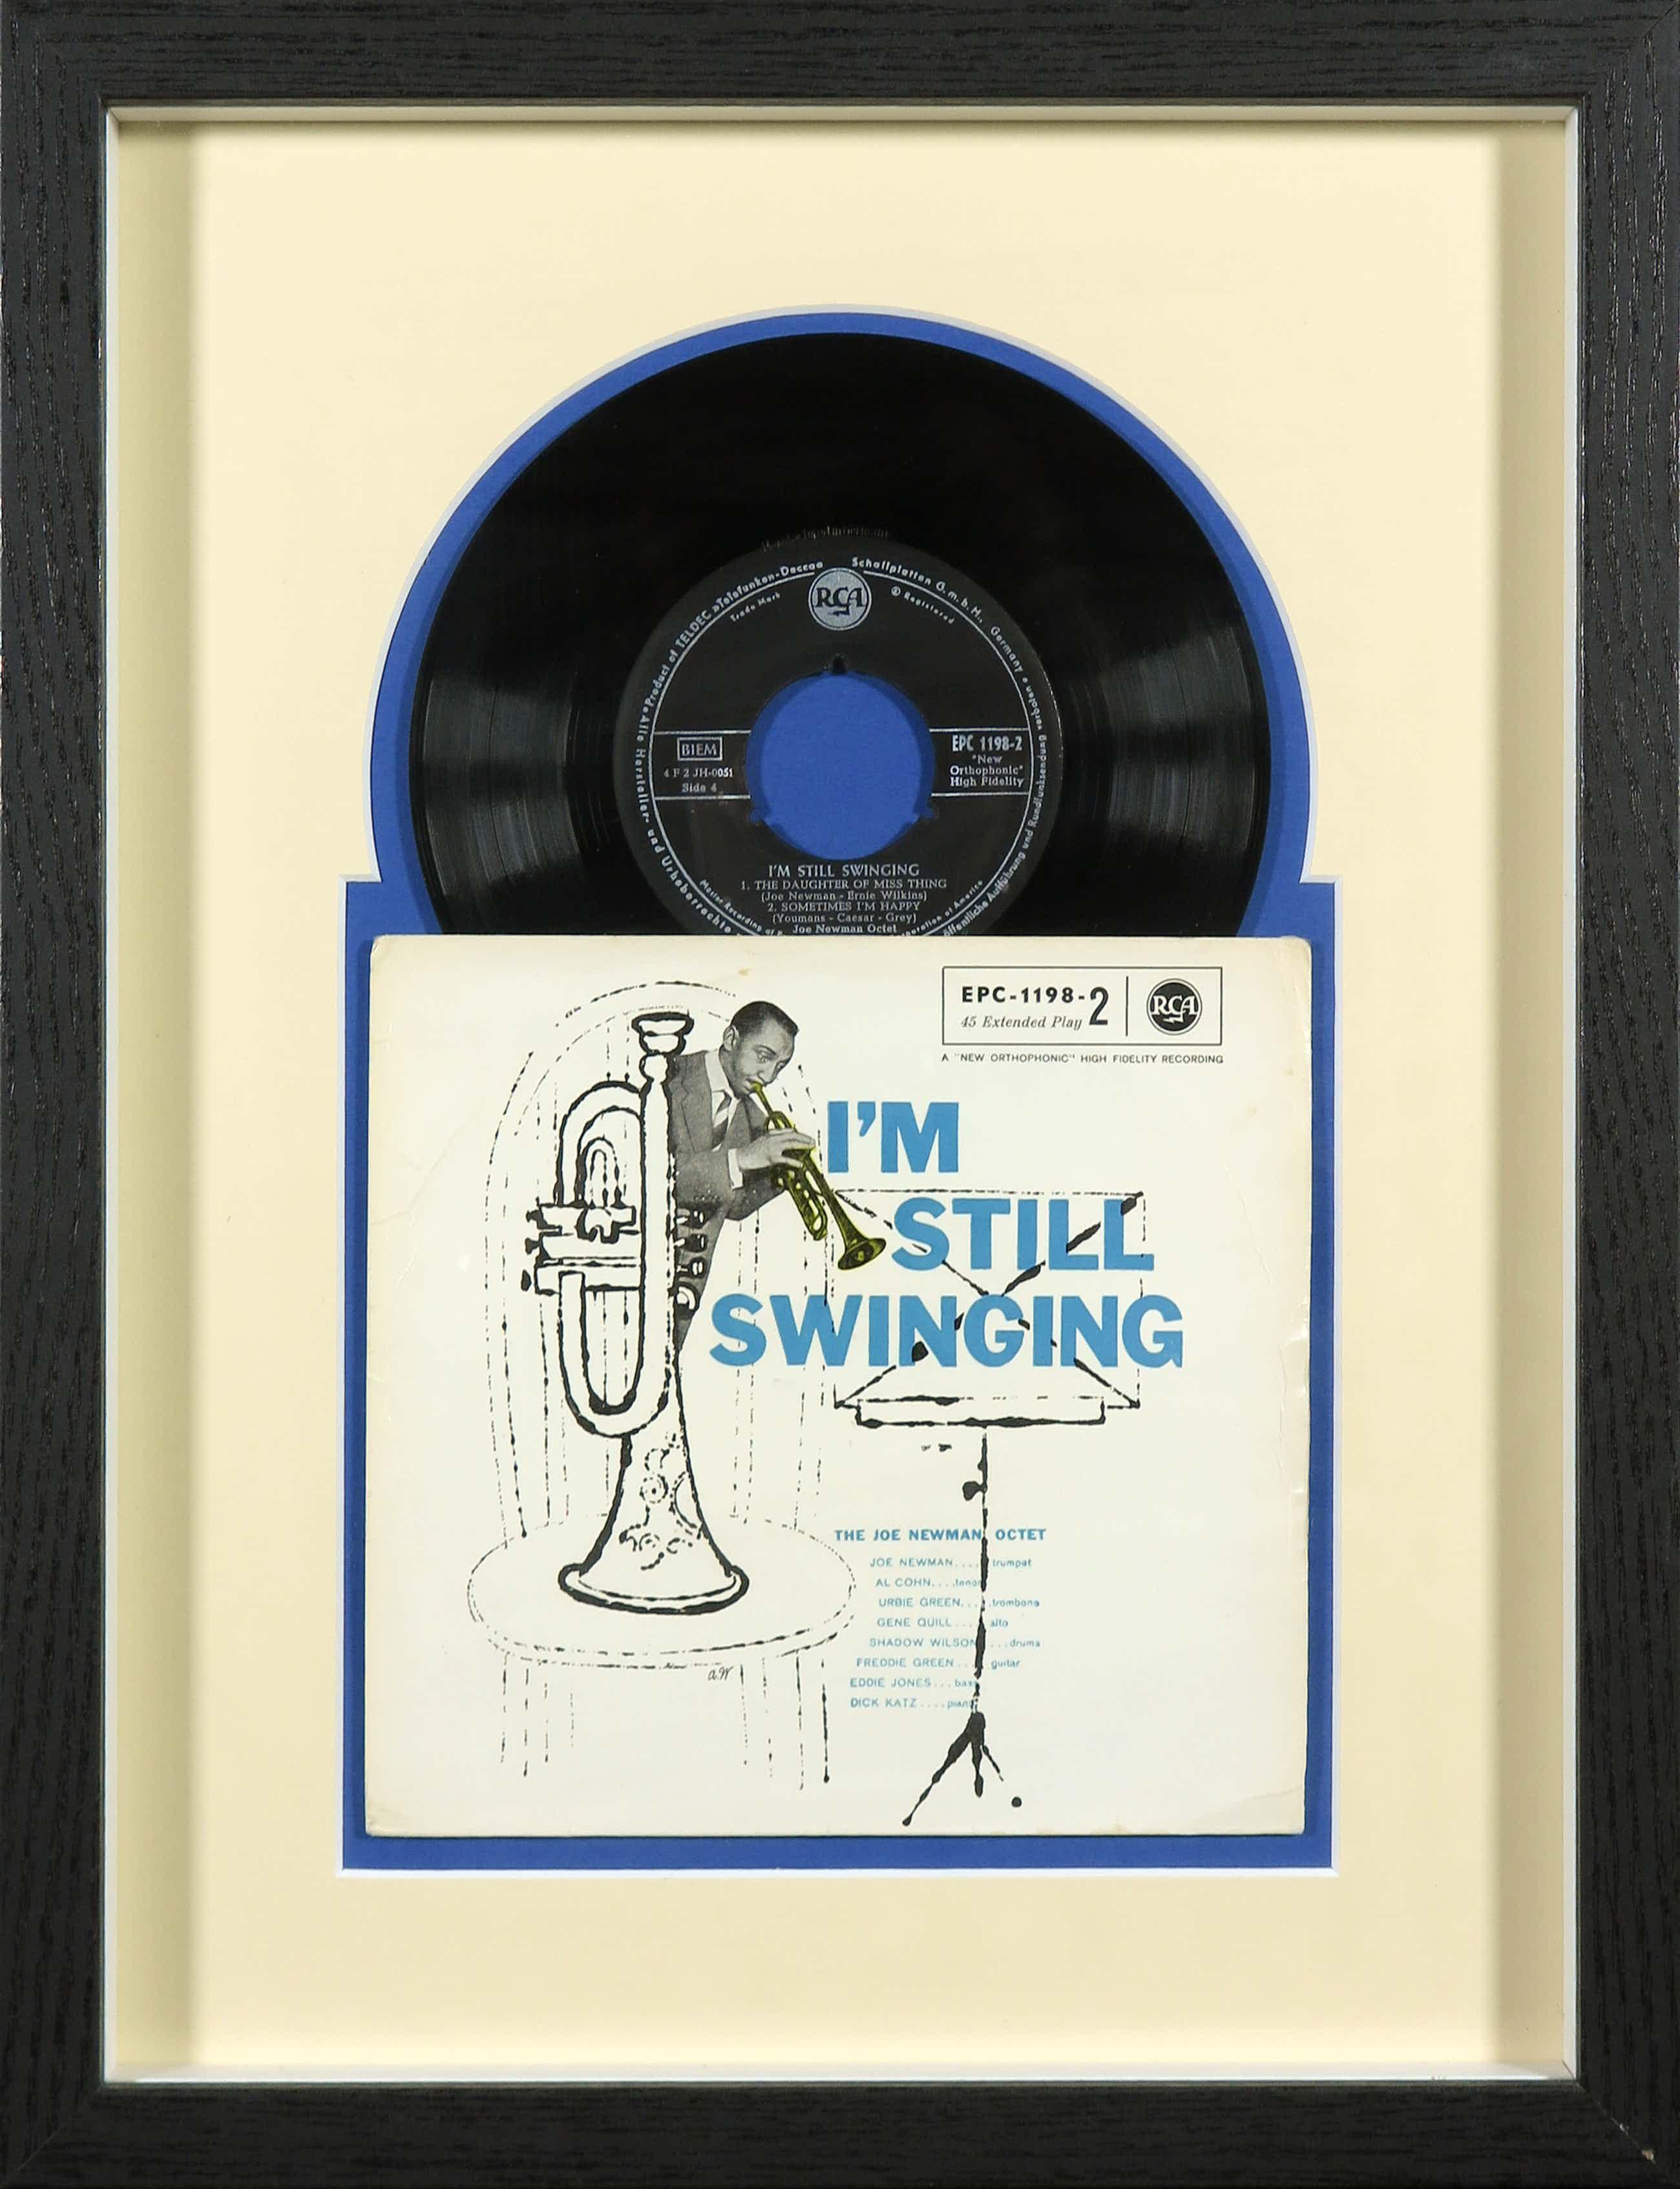 Andy Warhol - I'm Still Swinging - The Joe Newman Octet - Ingelijst kopen? Bied vanaf 40!